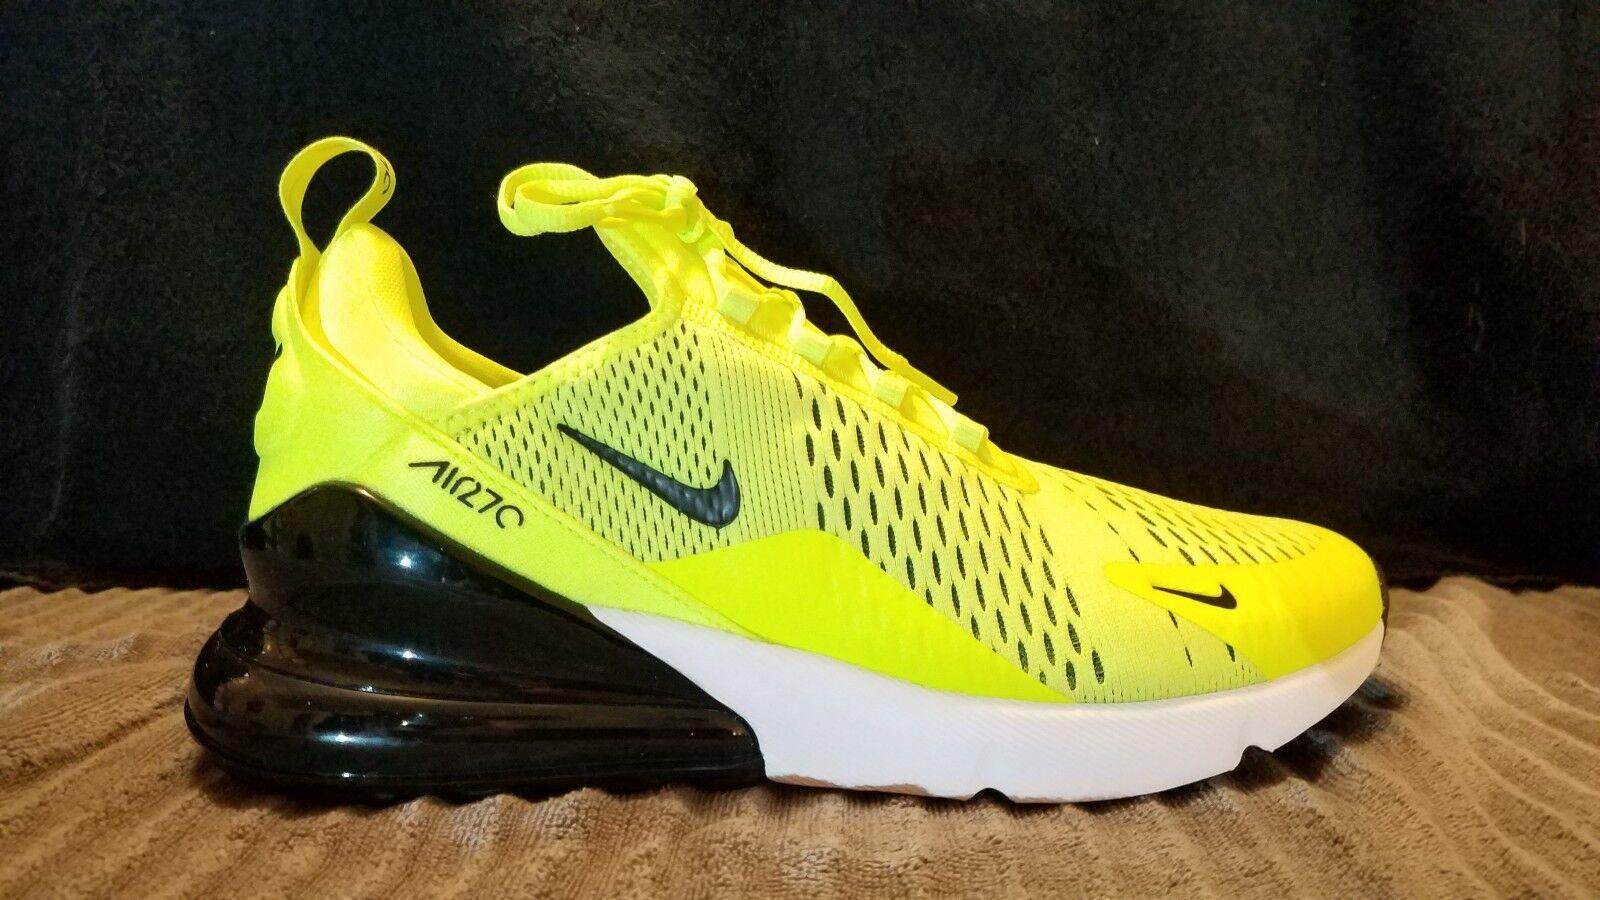 c730e6b3c02b Nike Air Max Max Max 270 AH8050-701 size 11 632281 - slippers ...